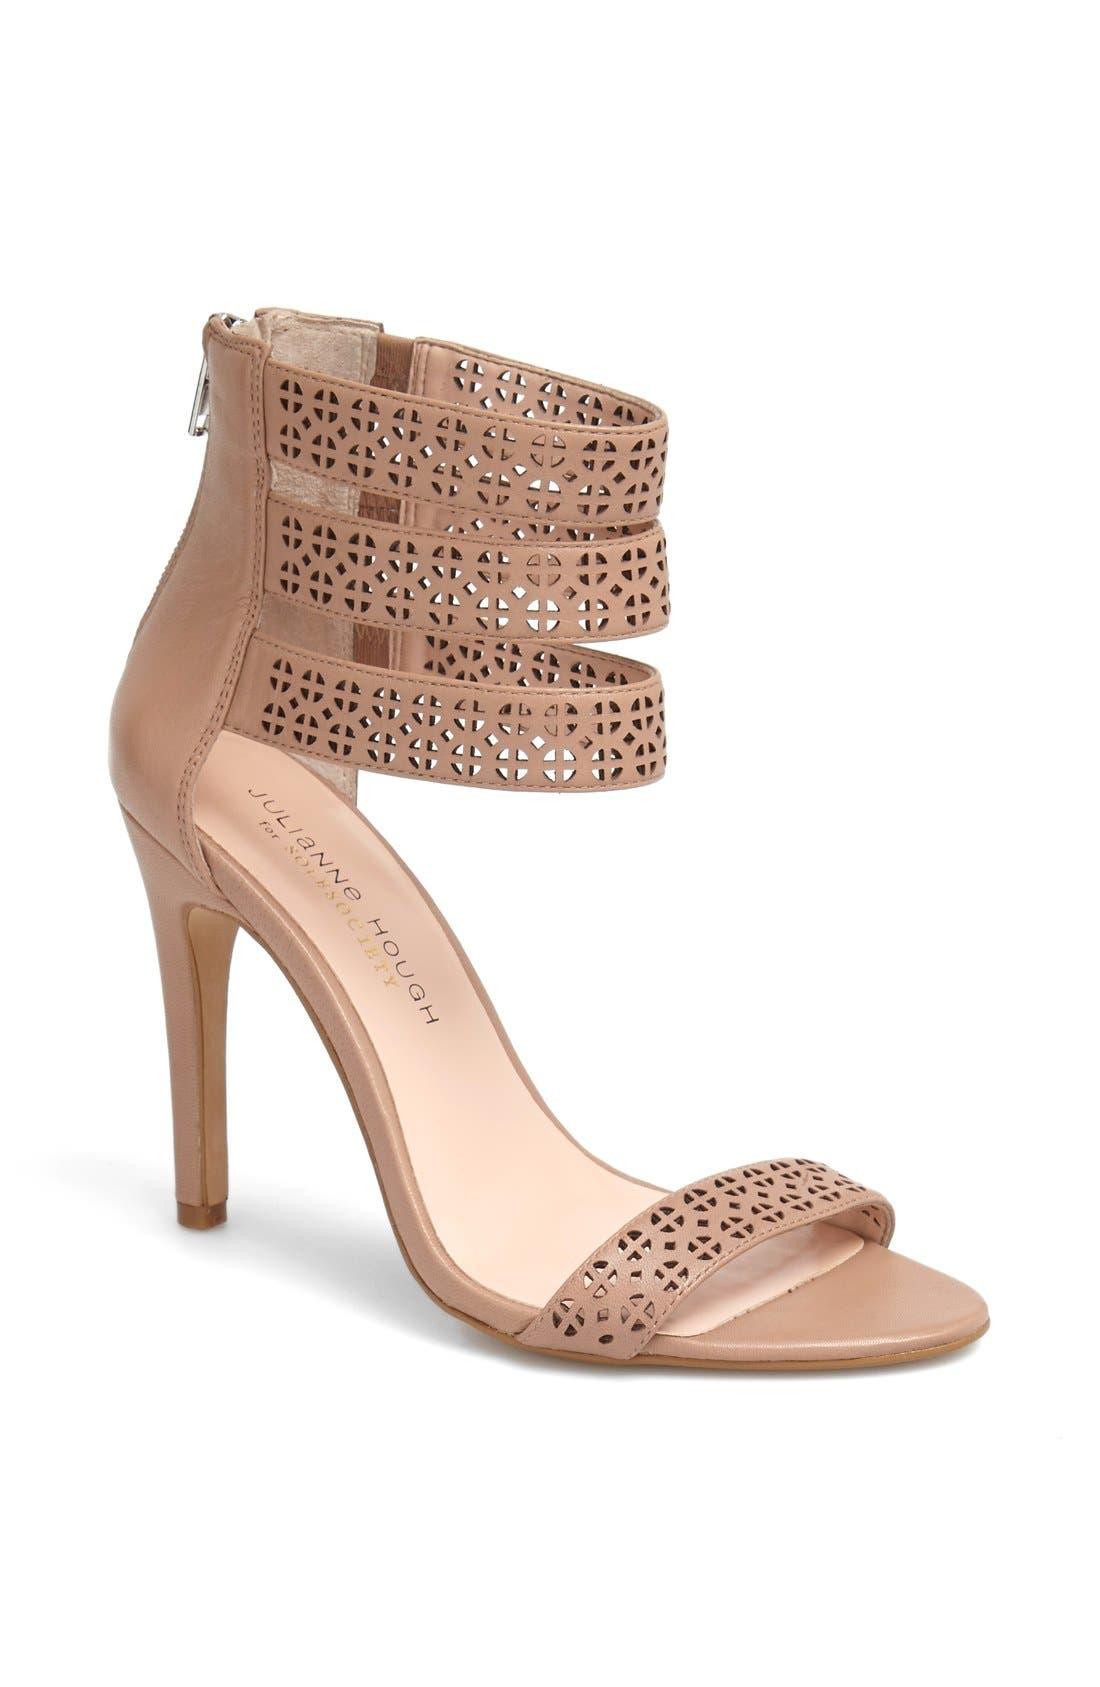 Main Image - Sole Society 'Abina' Sandal